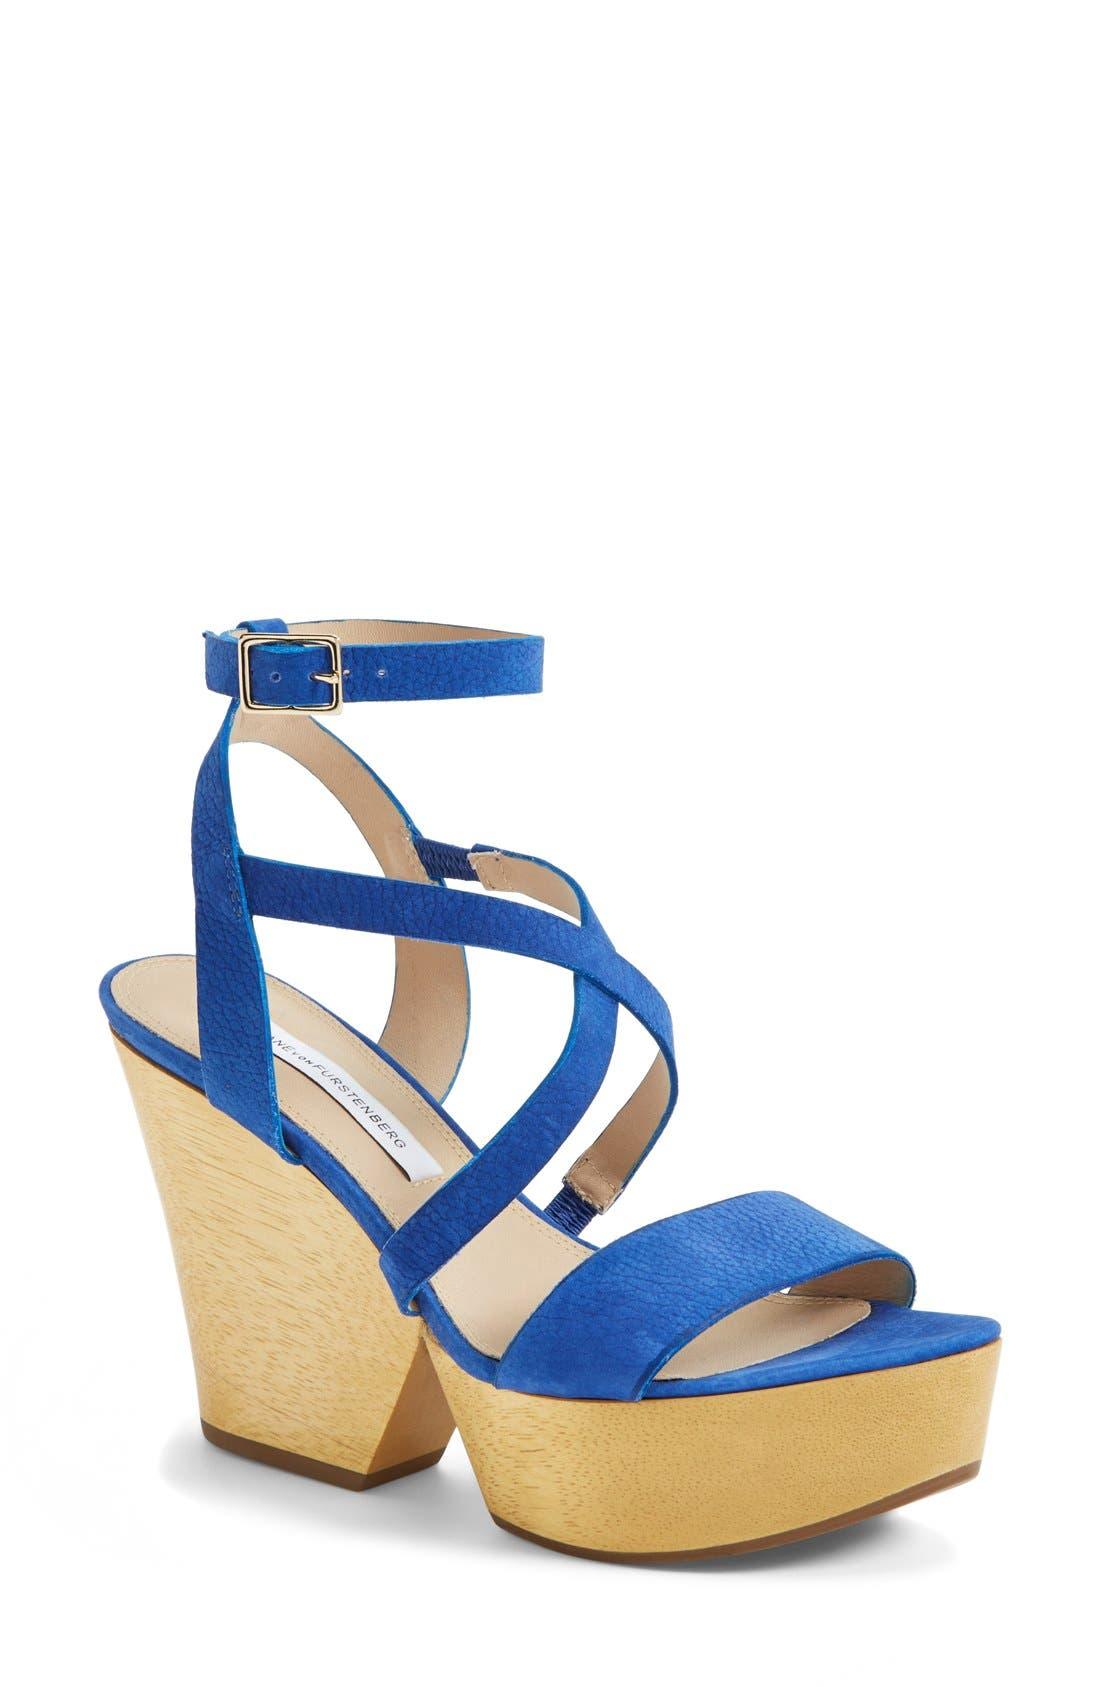 Main Image - Diane von Furstenberg 'Lamille' Leather Platform Wedge Sandal (Women)